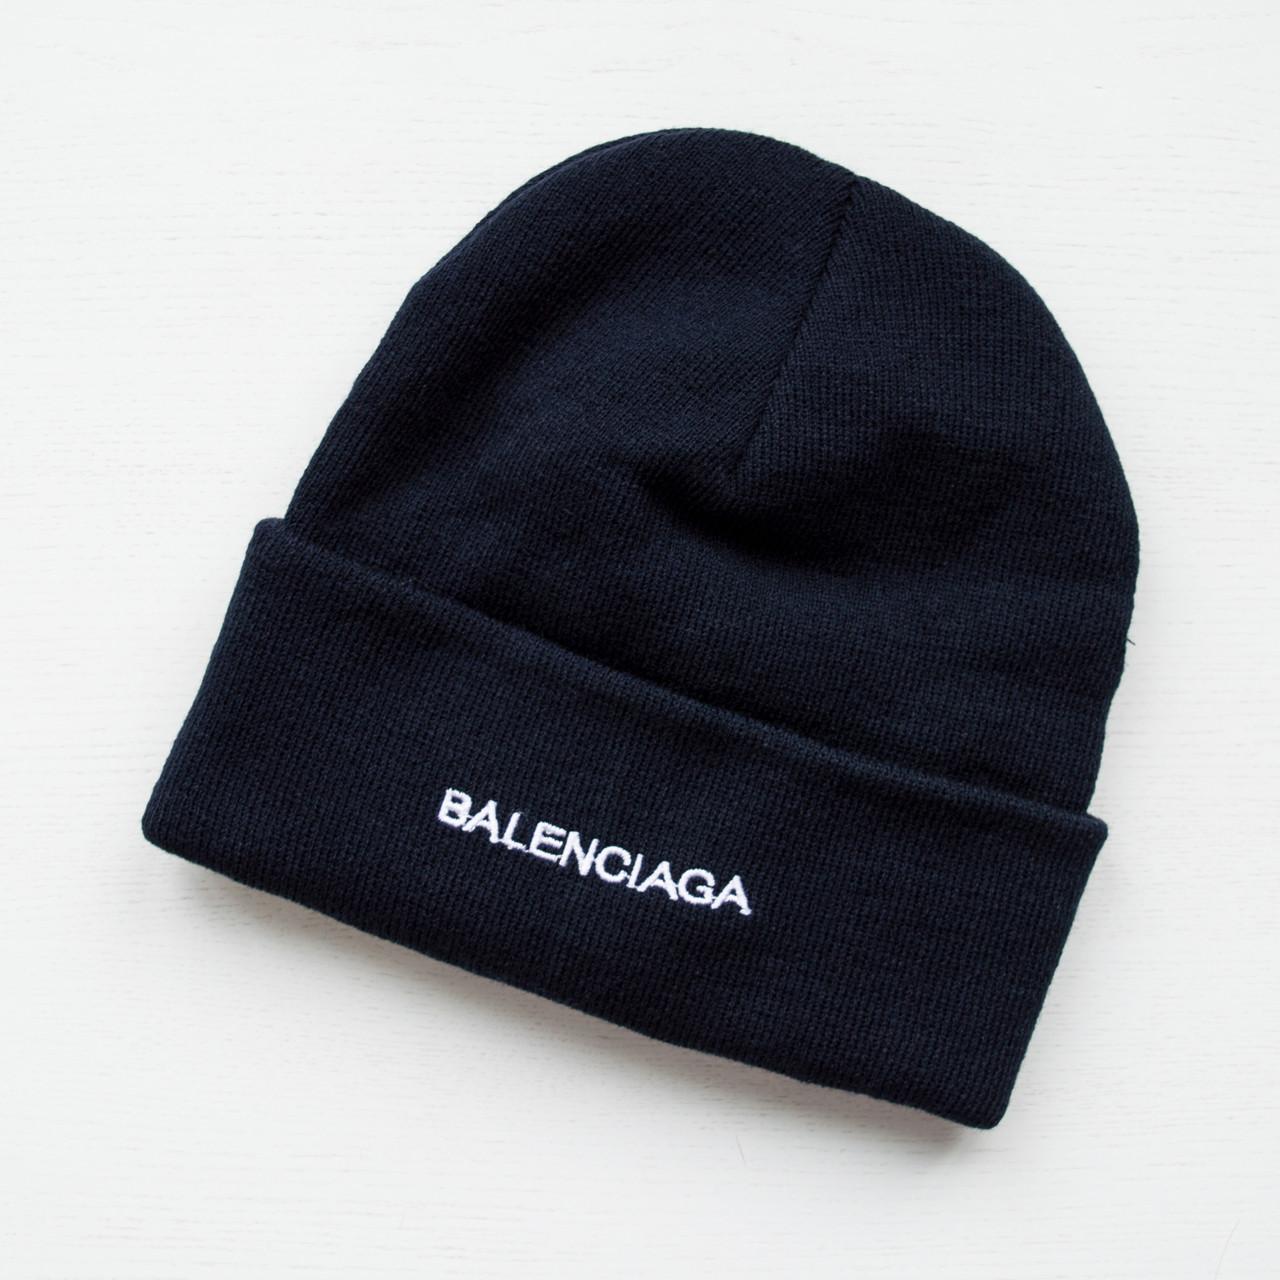 Зимняя шапка синяя унисекс Balenciaga